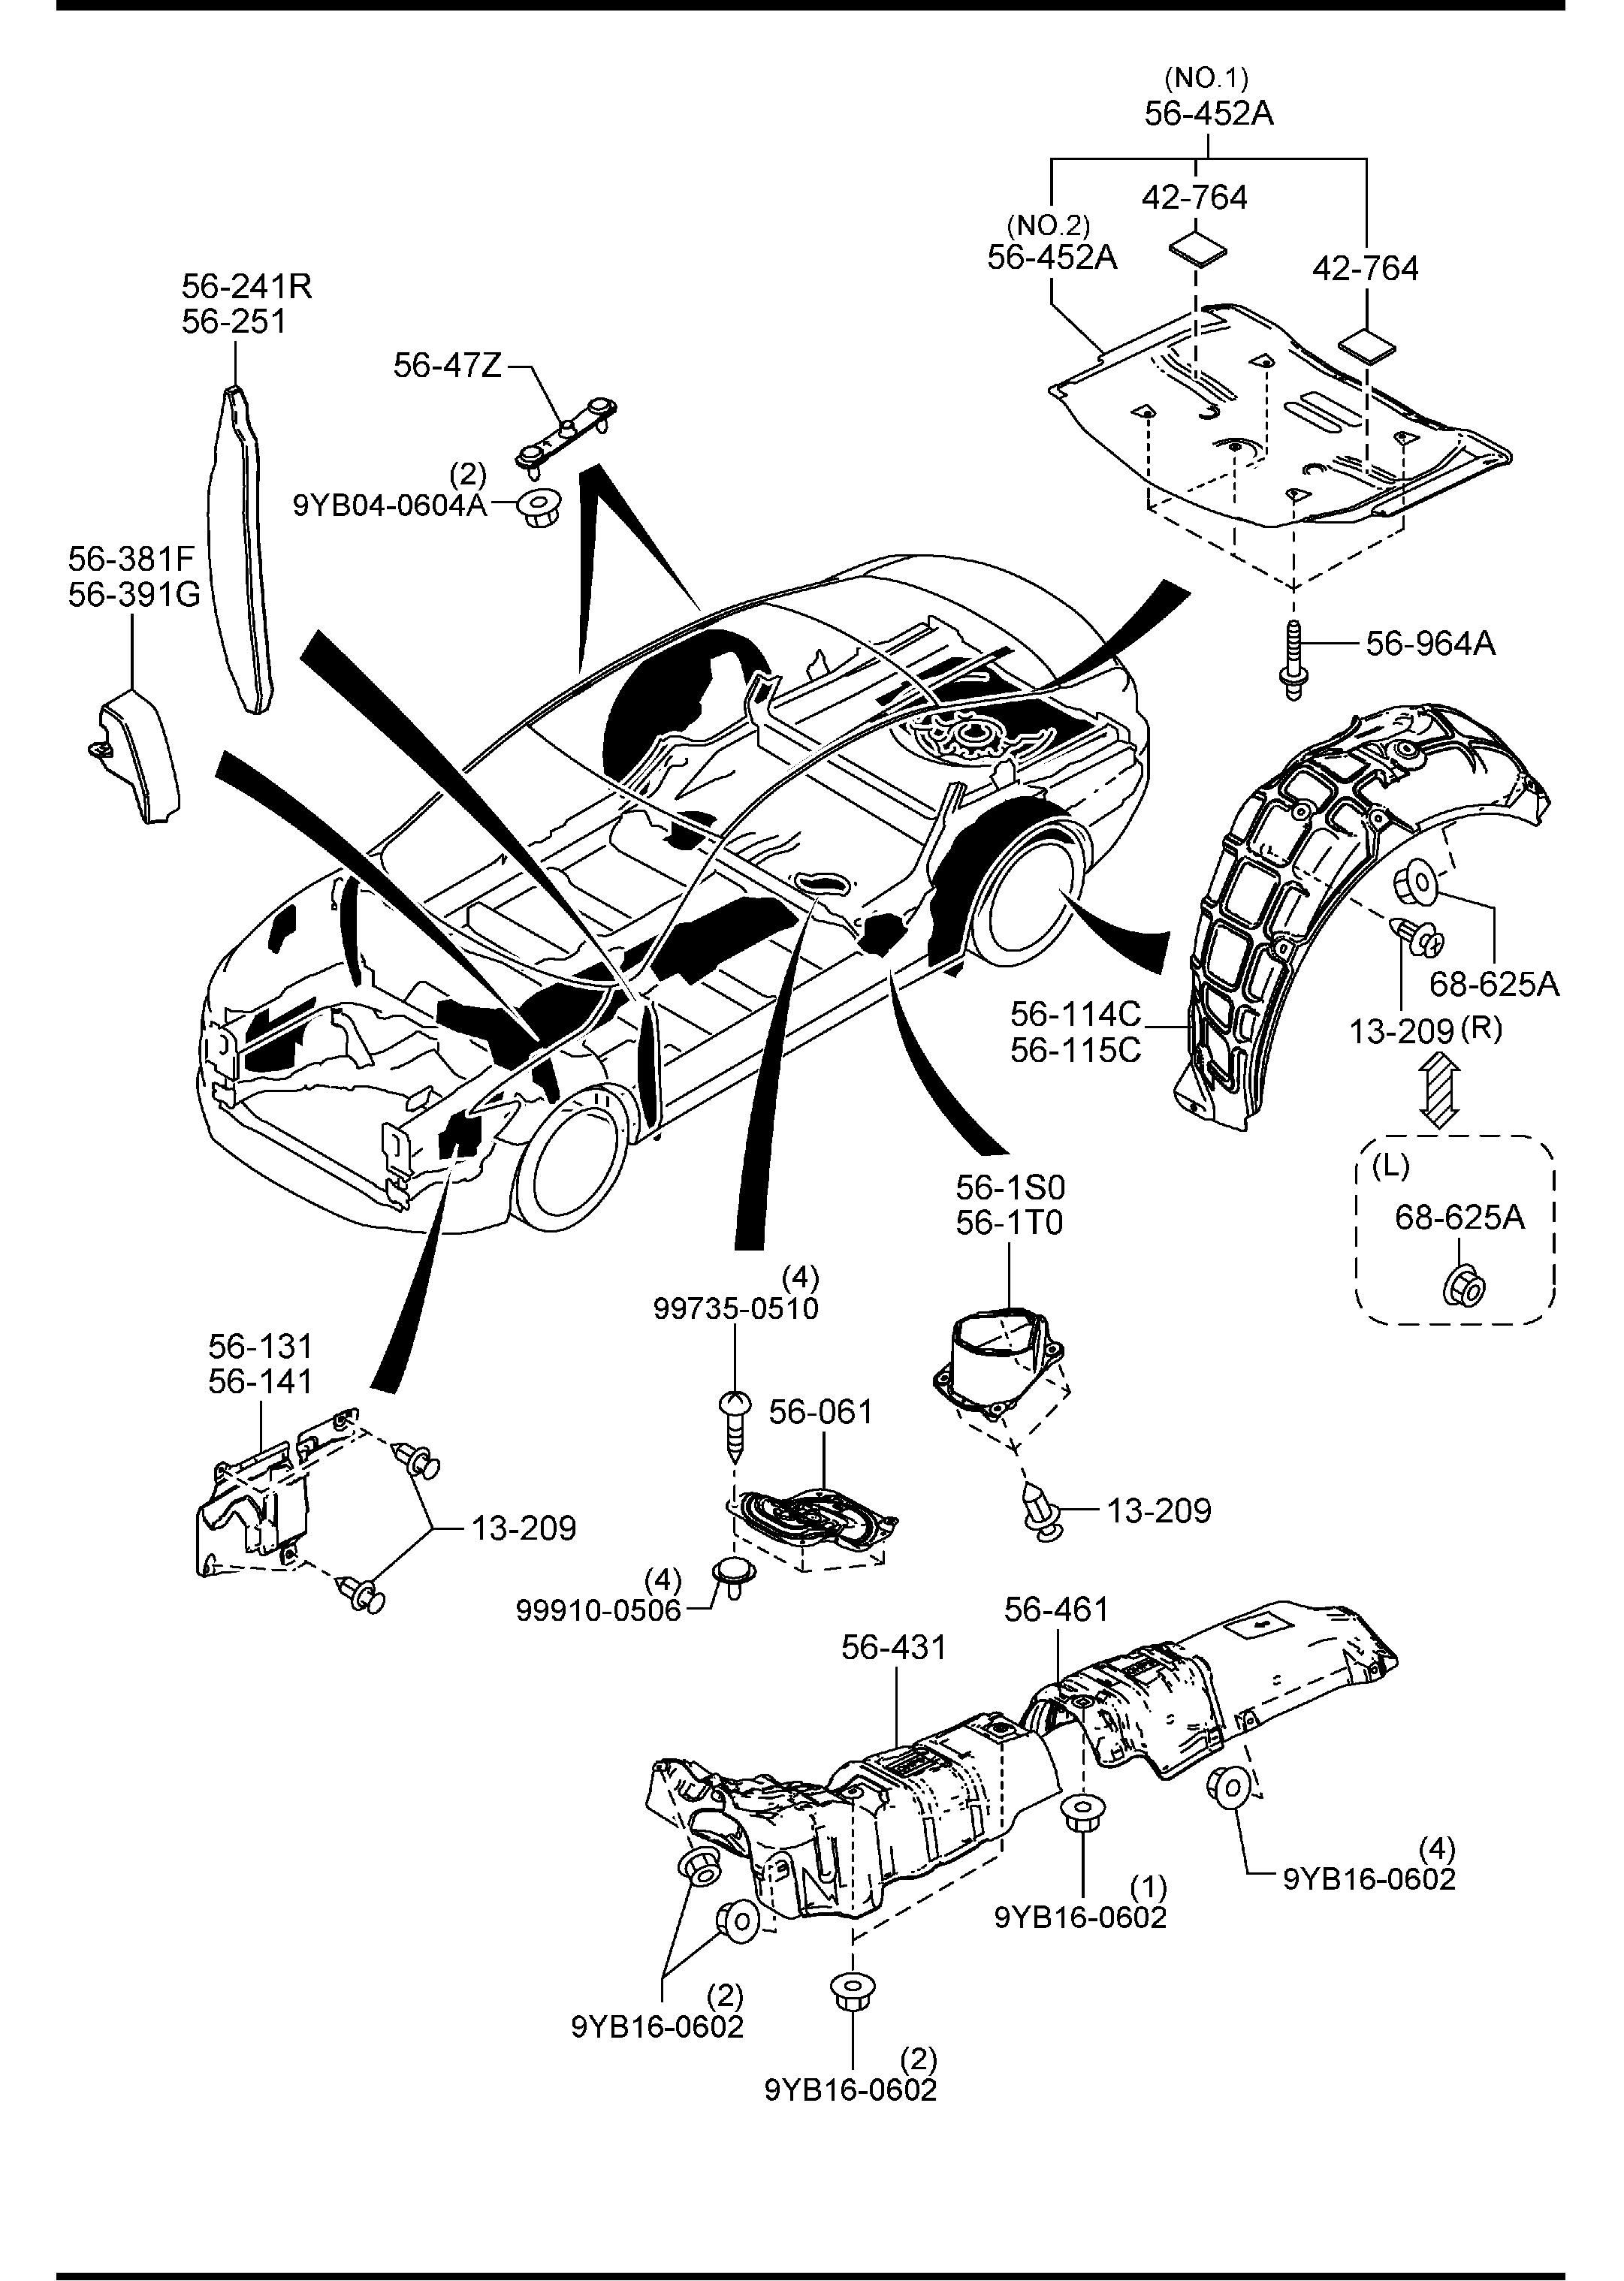 2014 Mazda Mazda 6 Fastener. Led, closure, impact ...